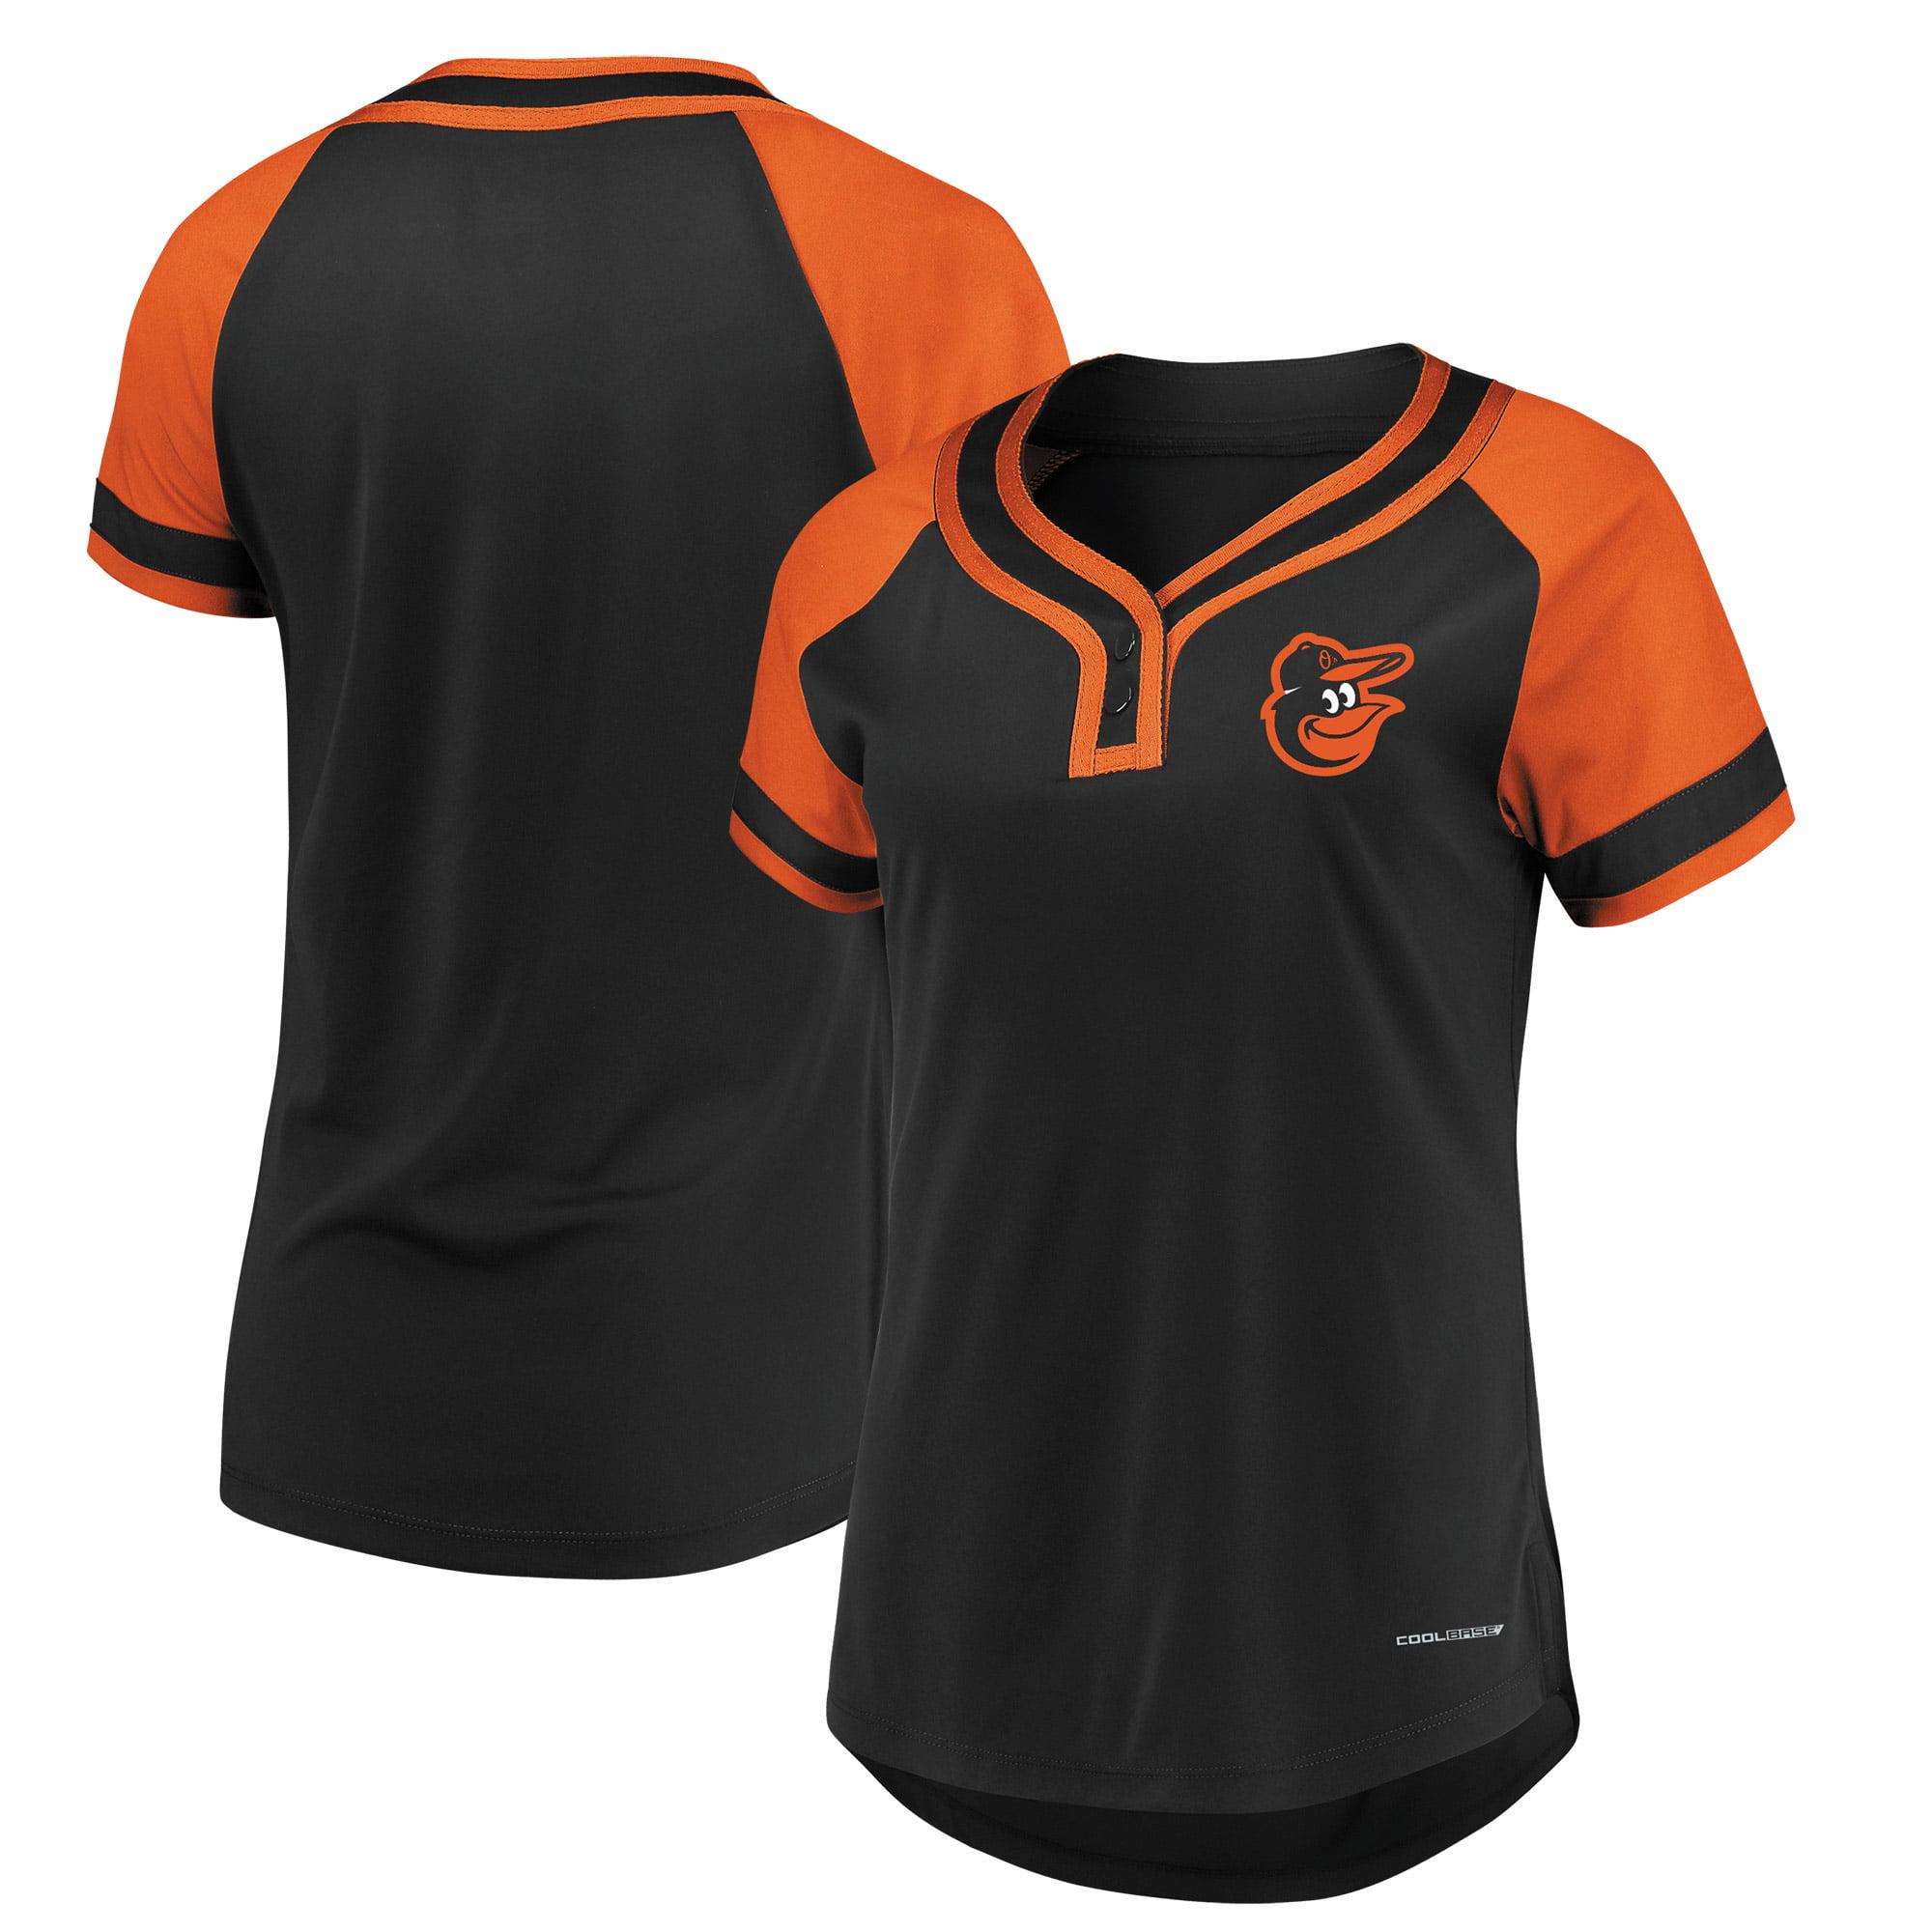 Baltimore Orioles Majestic Women's Plus Size League Cool Base T-Shirt Black Orange by Profile